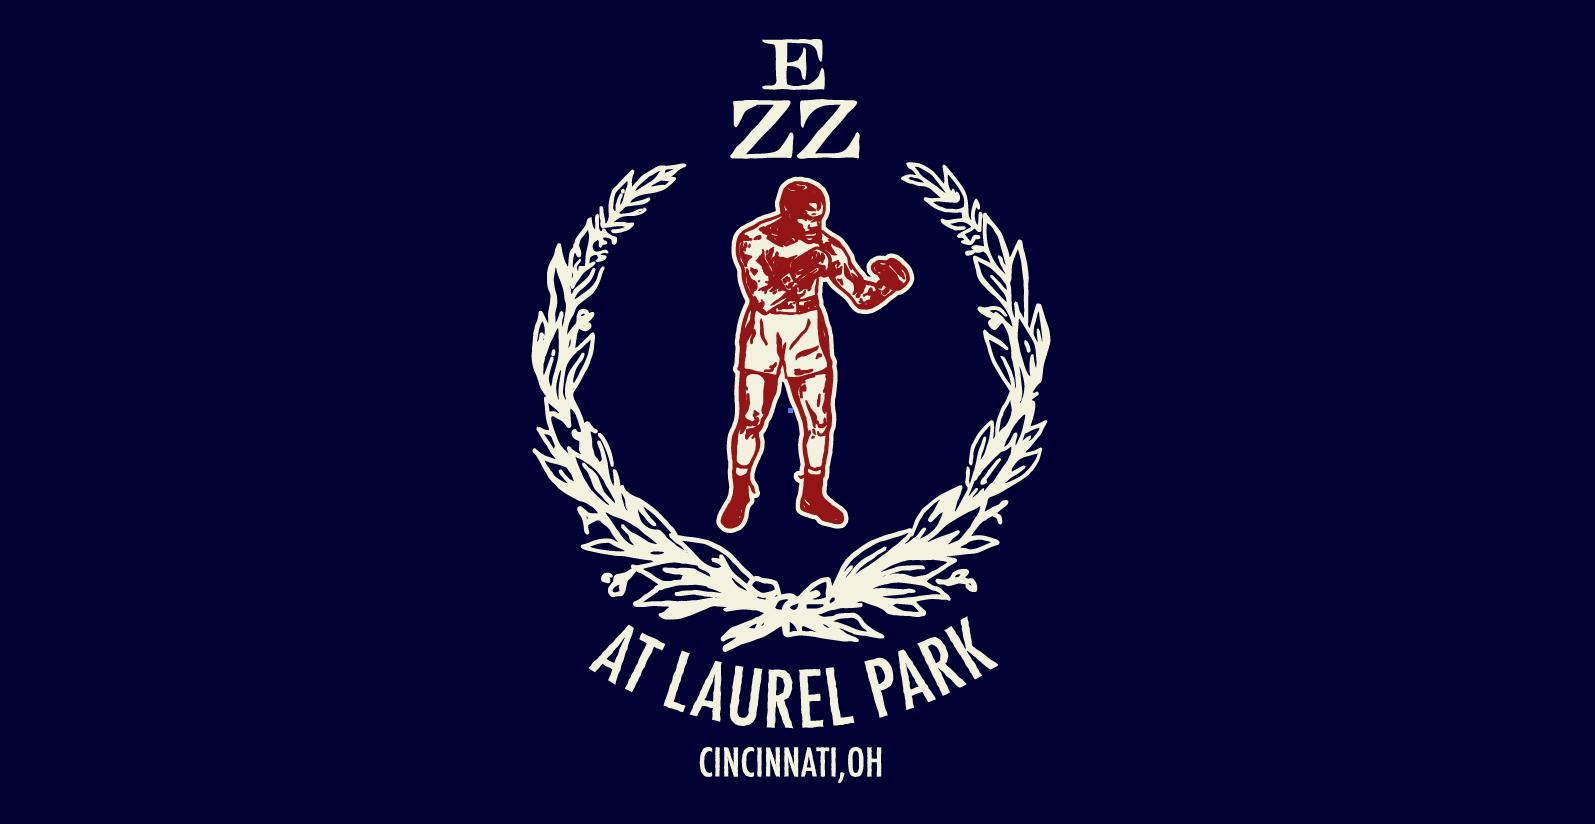 EZZ at Laurel Park, Cincinnati, OH